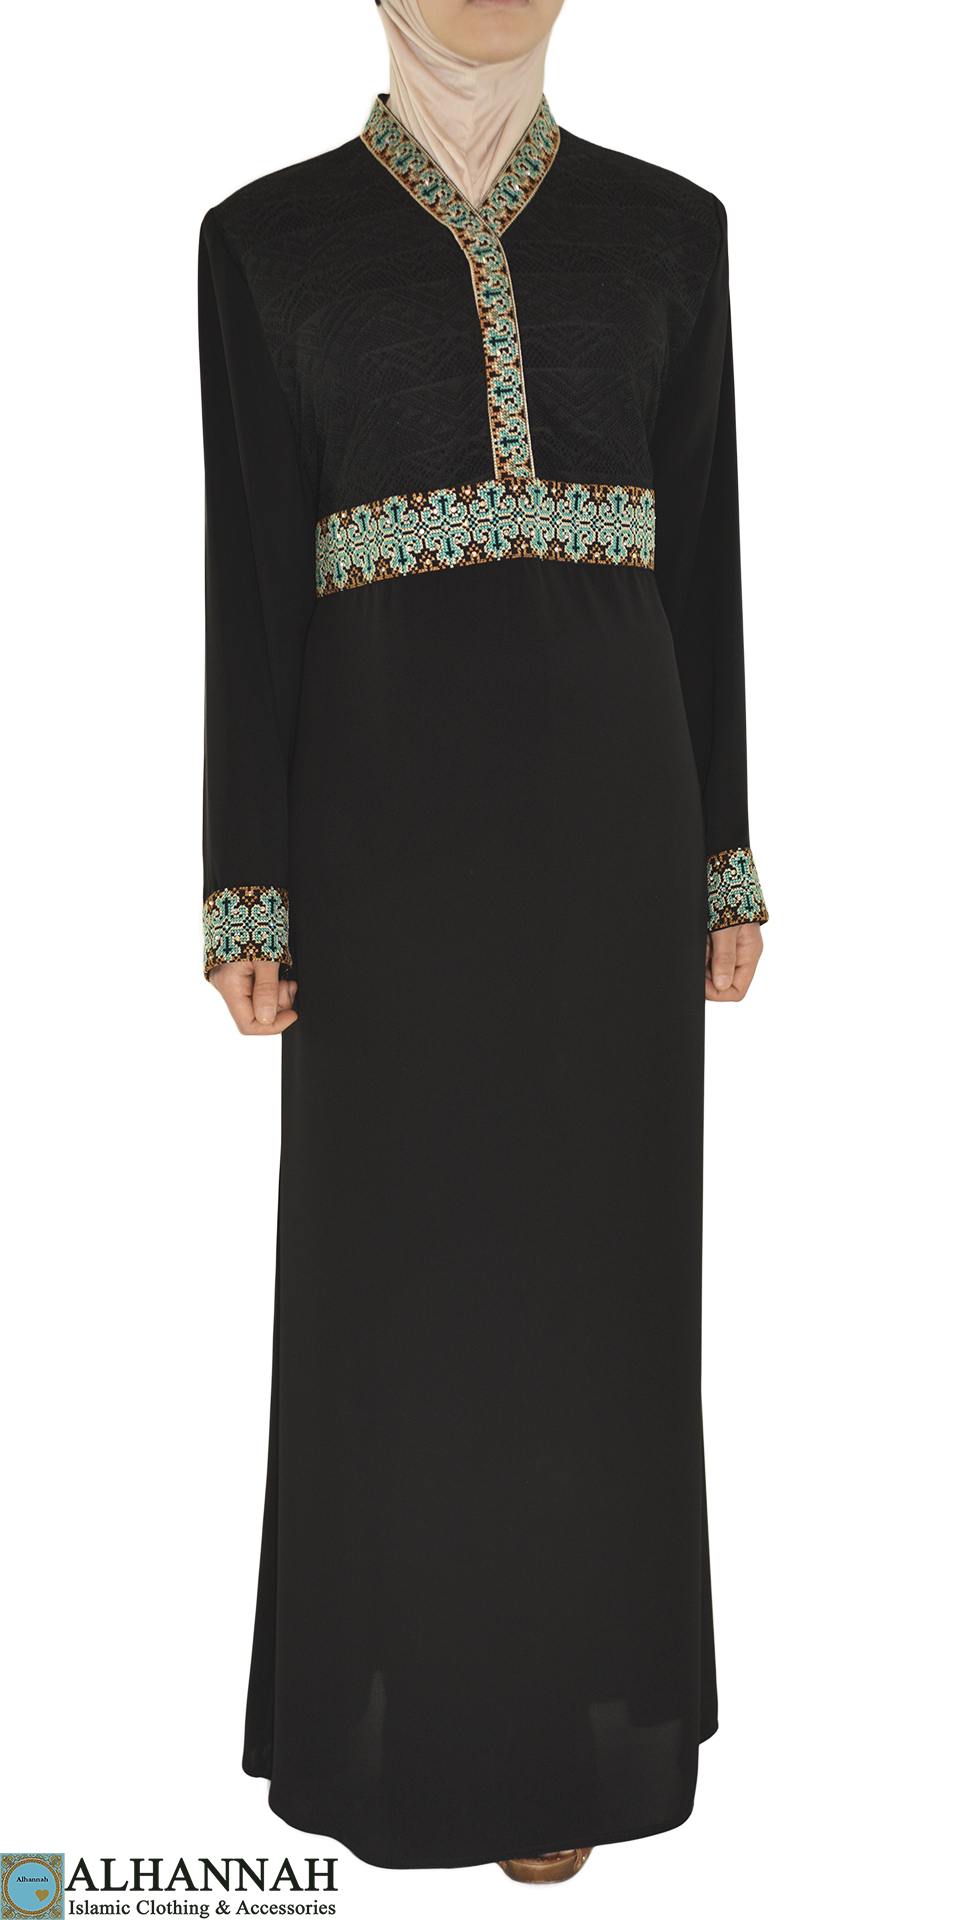 Abaya Embroidery Patterns Karimah Abaya Ab670